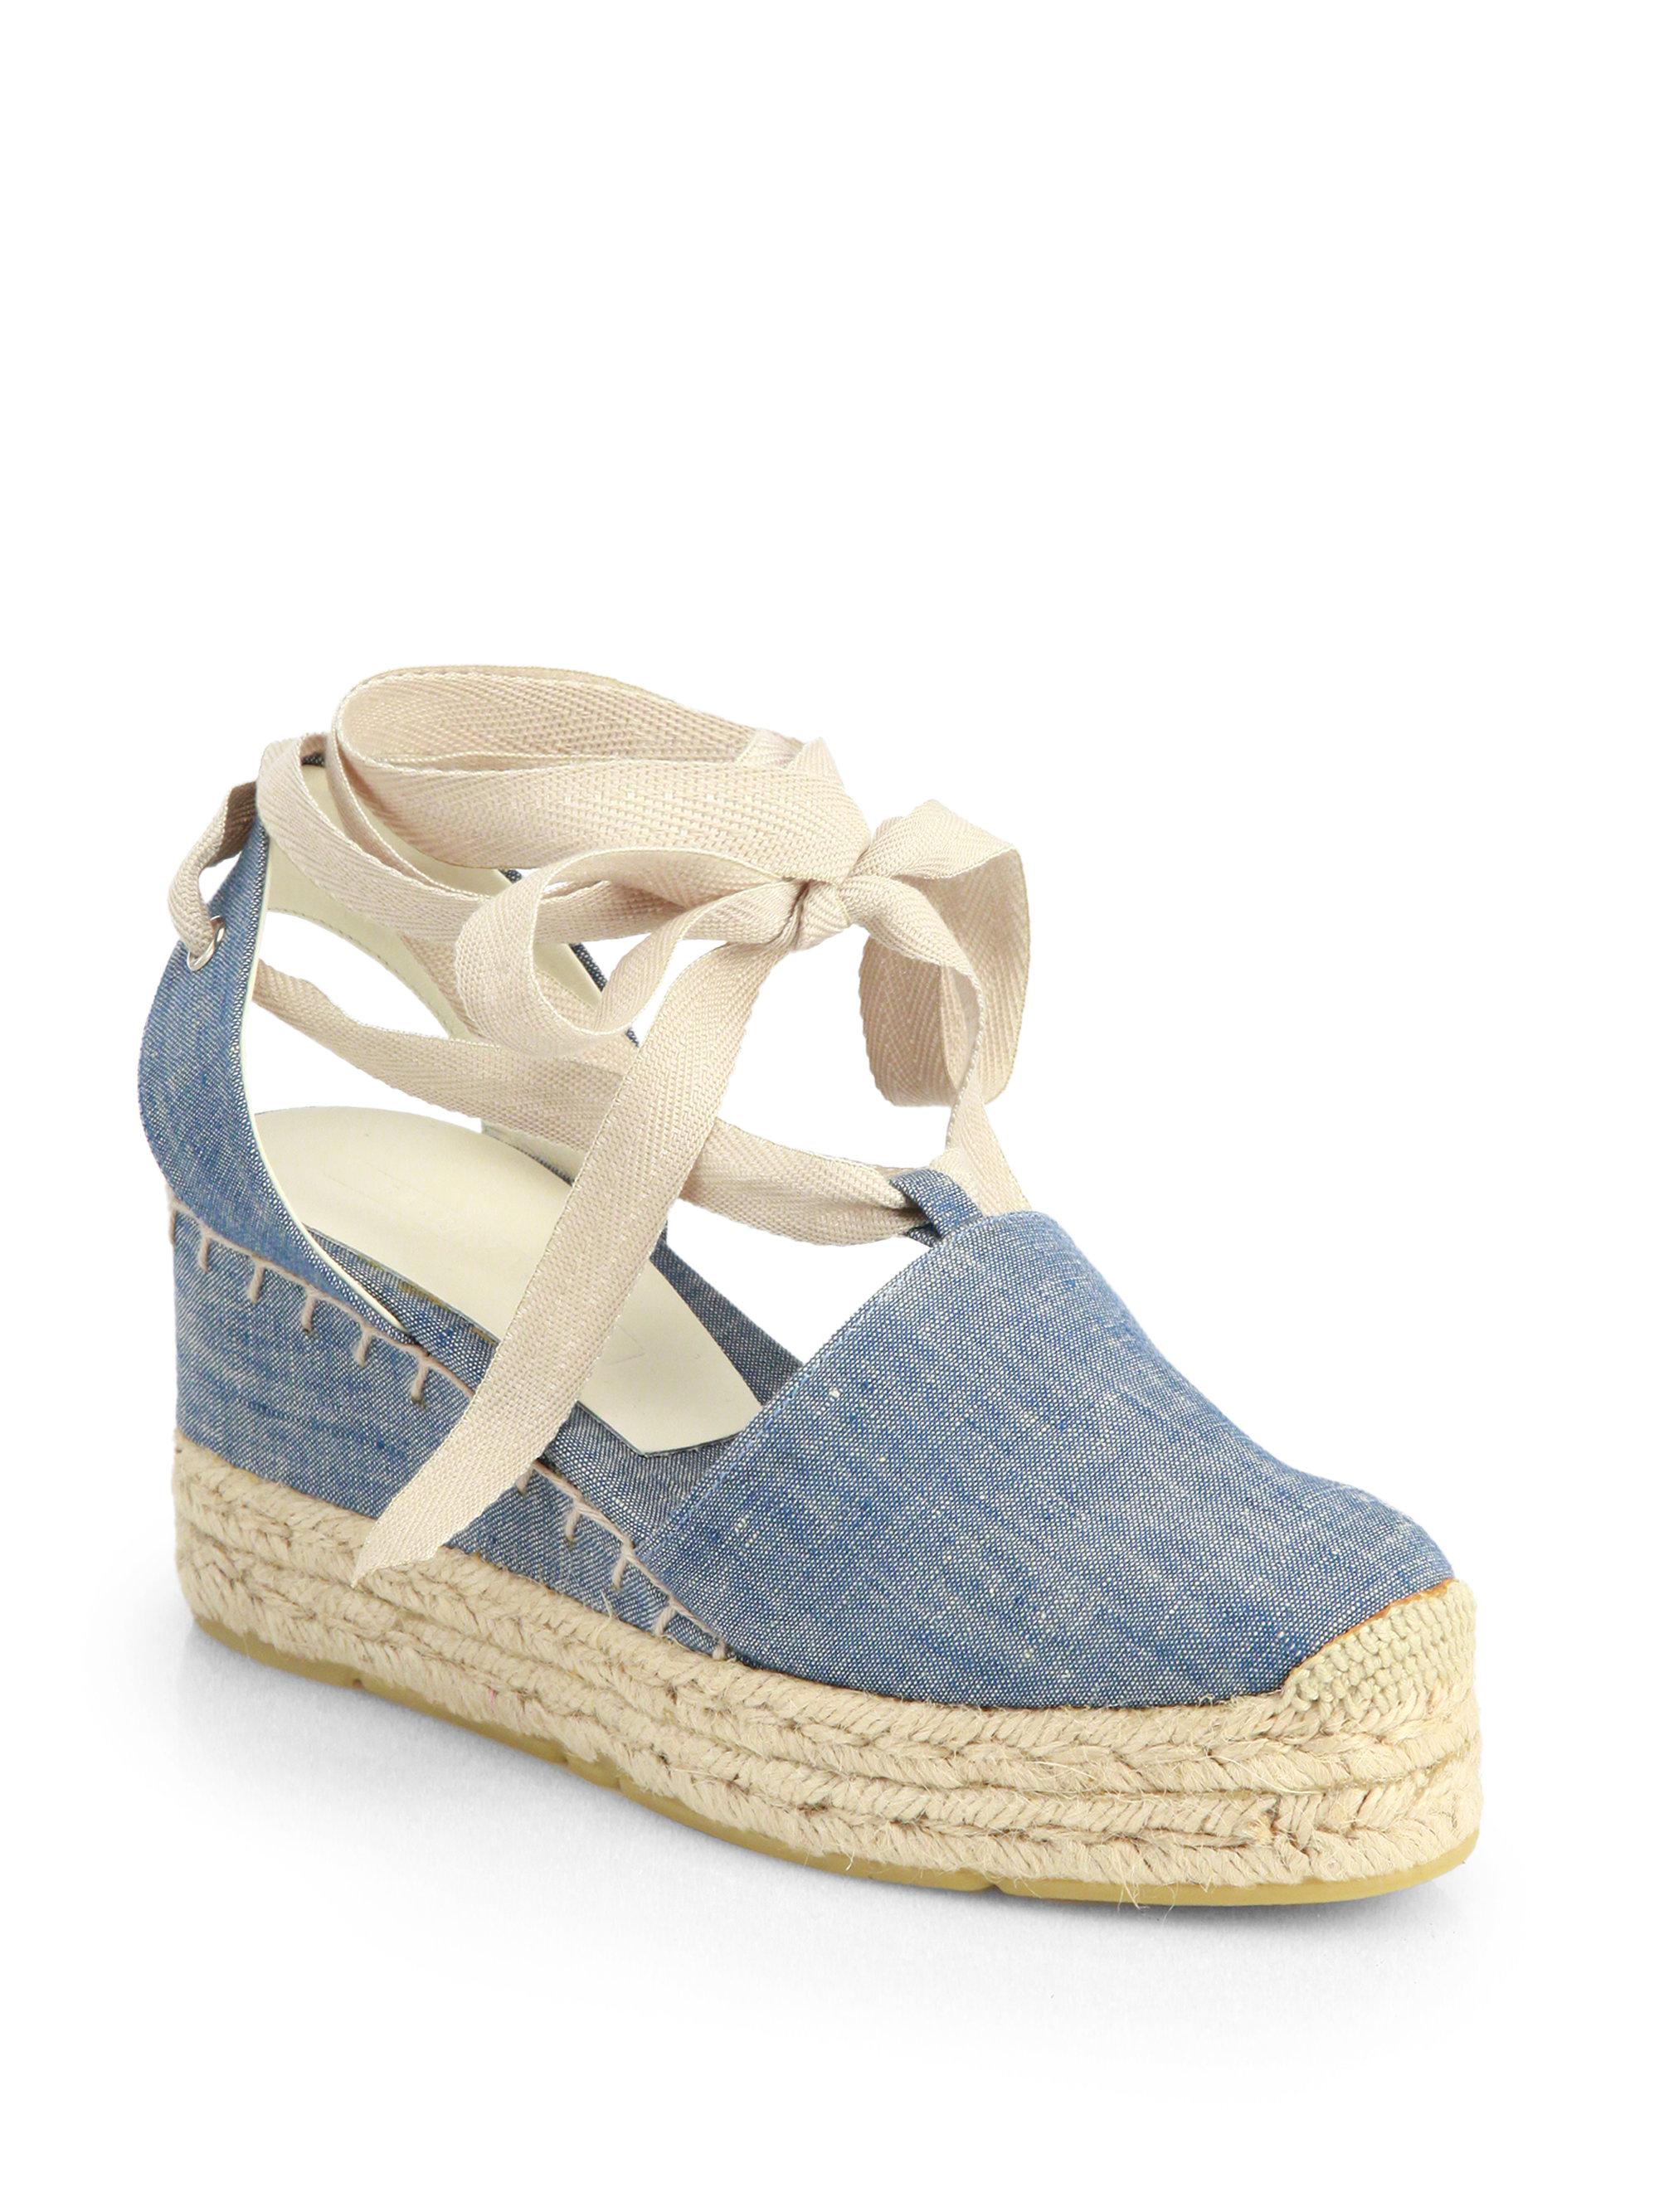 ralph lauren collection uma denim espadrille wedge sandals in blue lyst. Black Bedroom Furniture Sets. Home Design Ideas